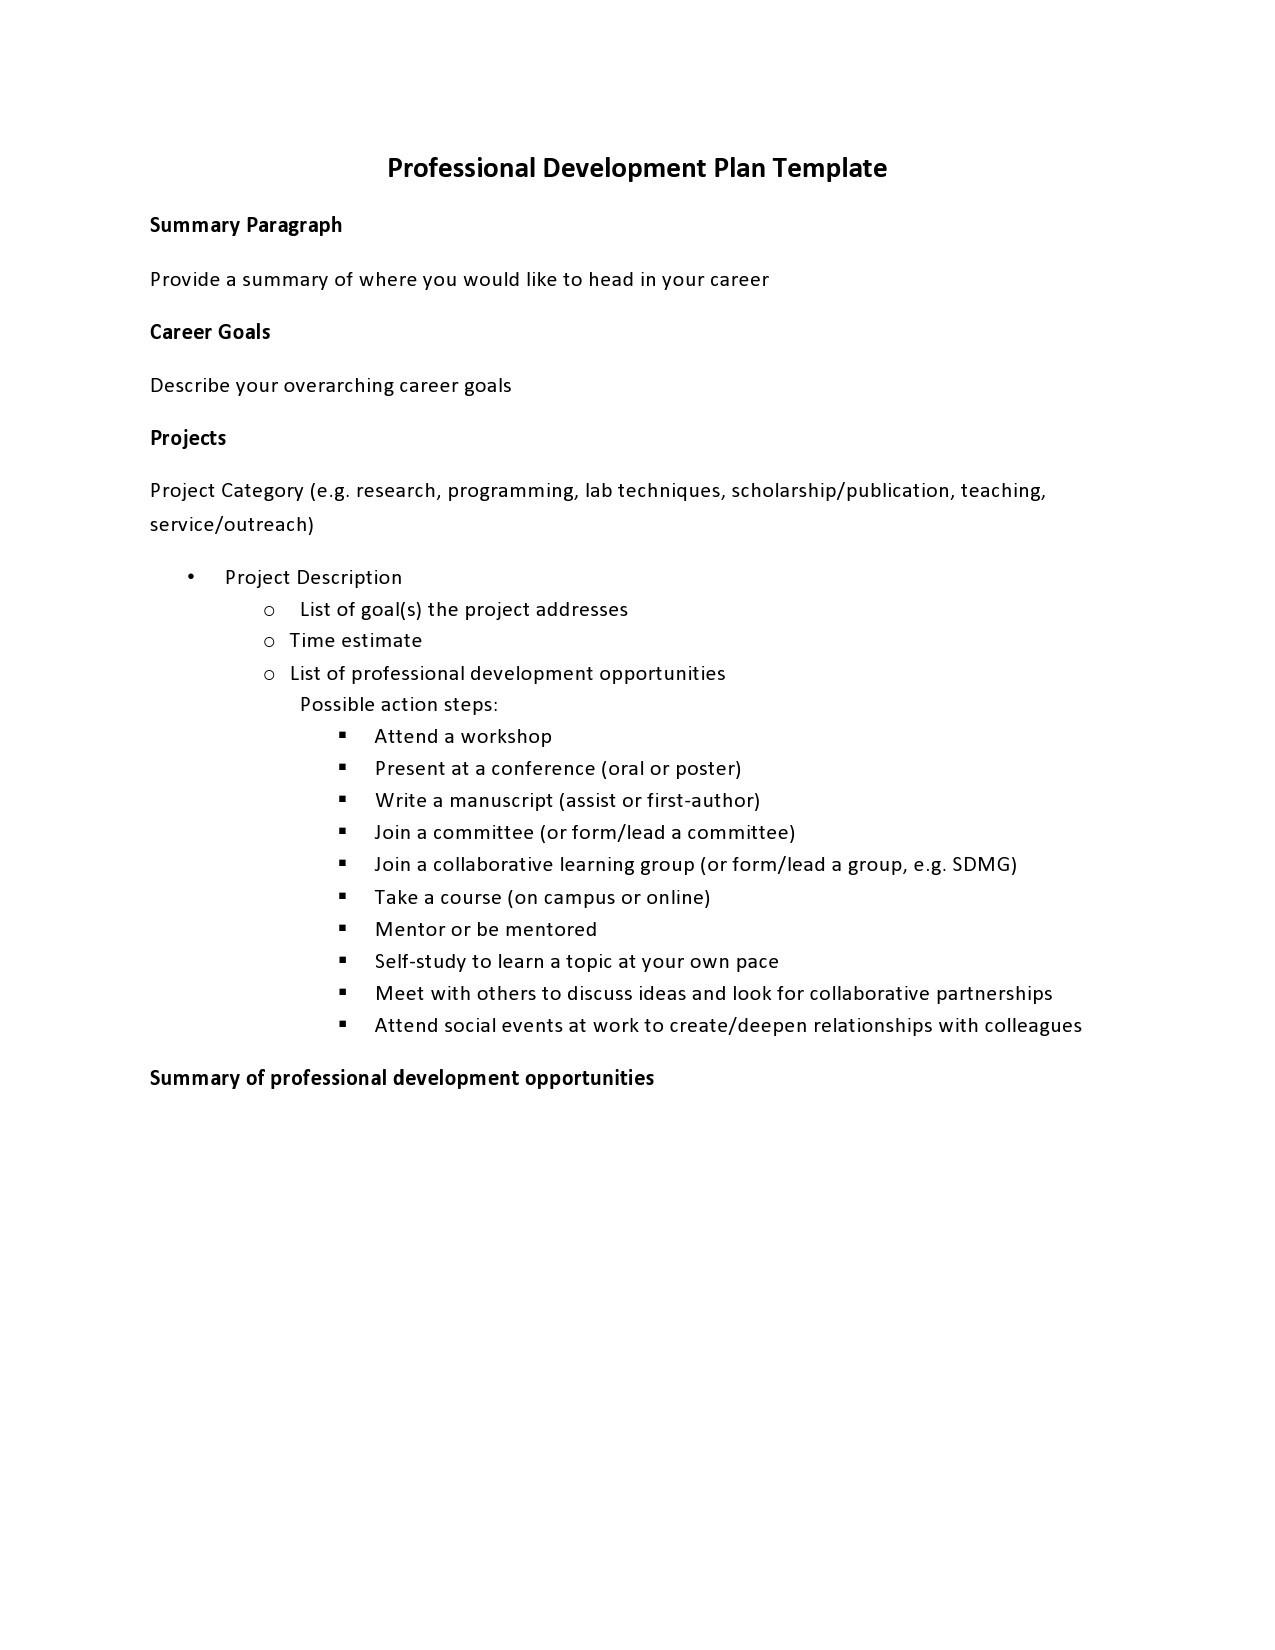 Free professional development plan 05